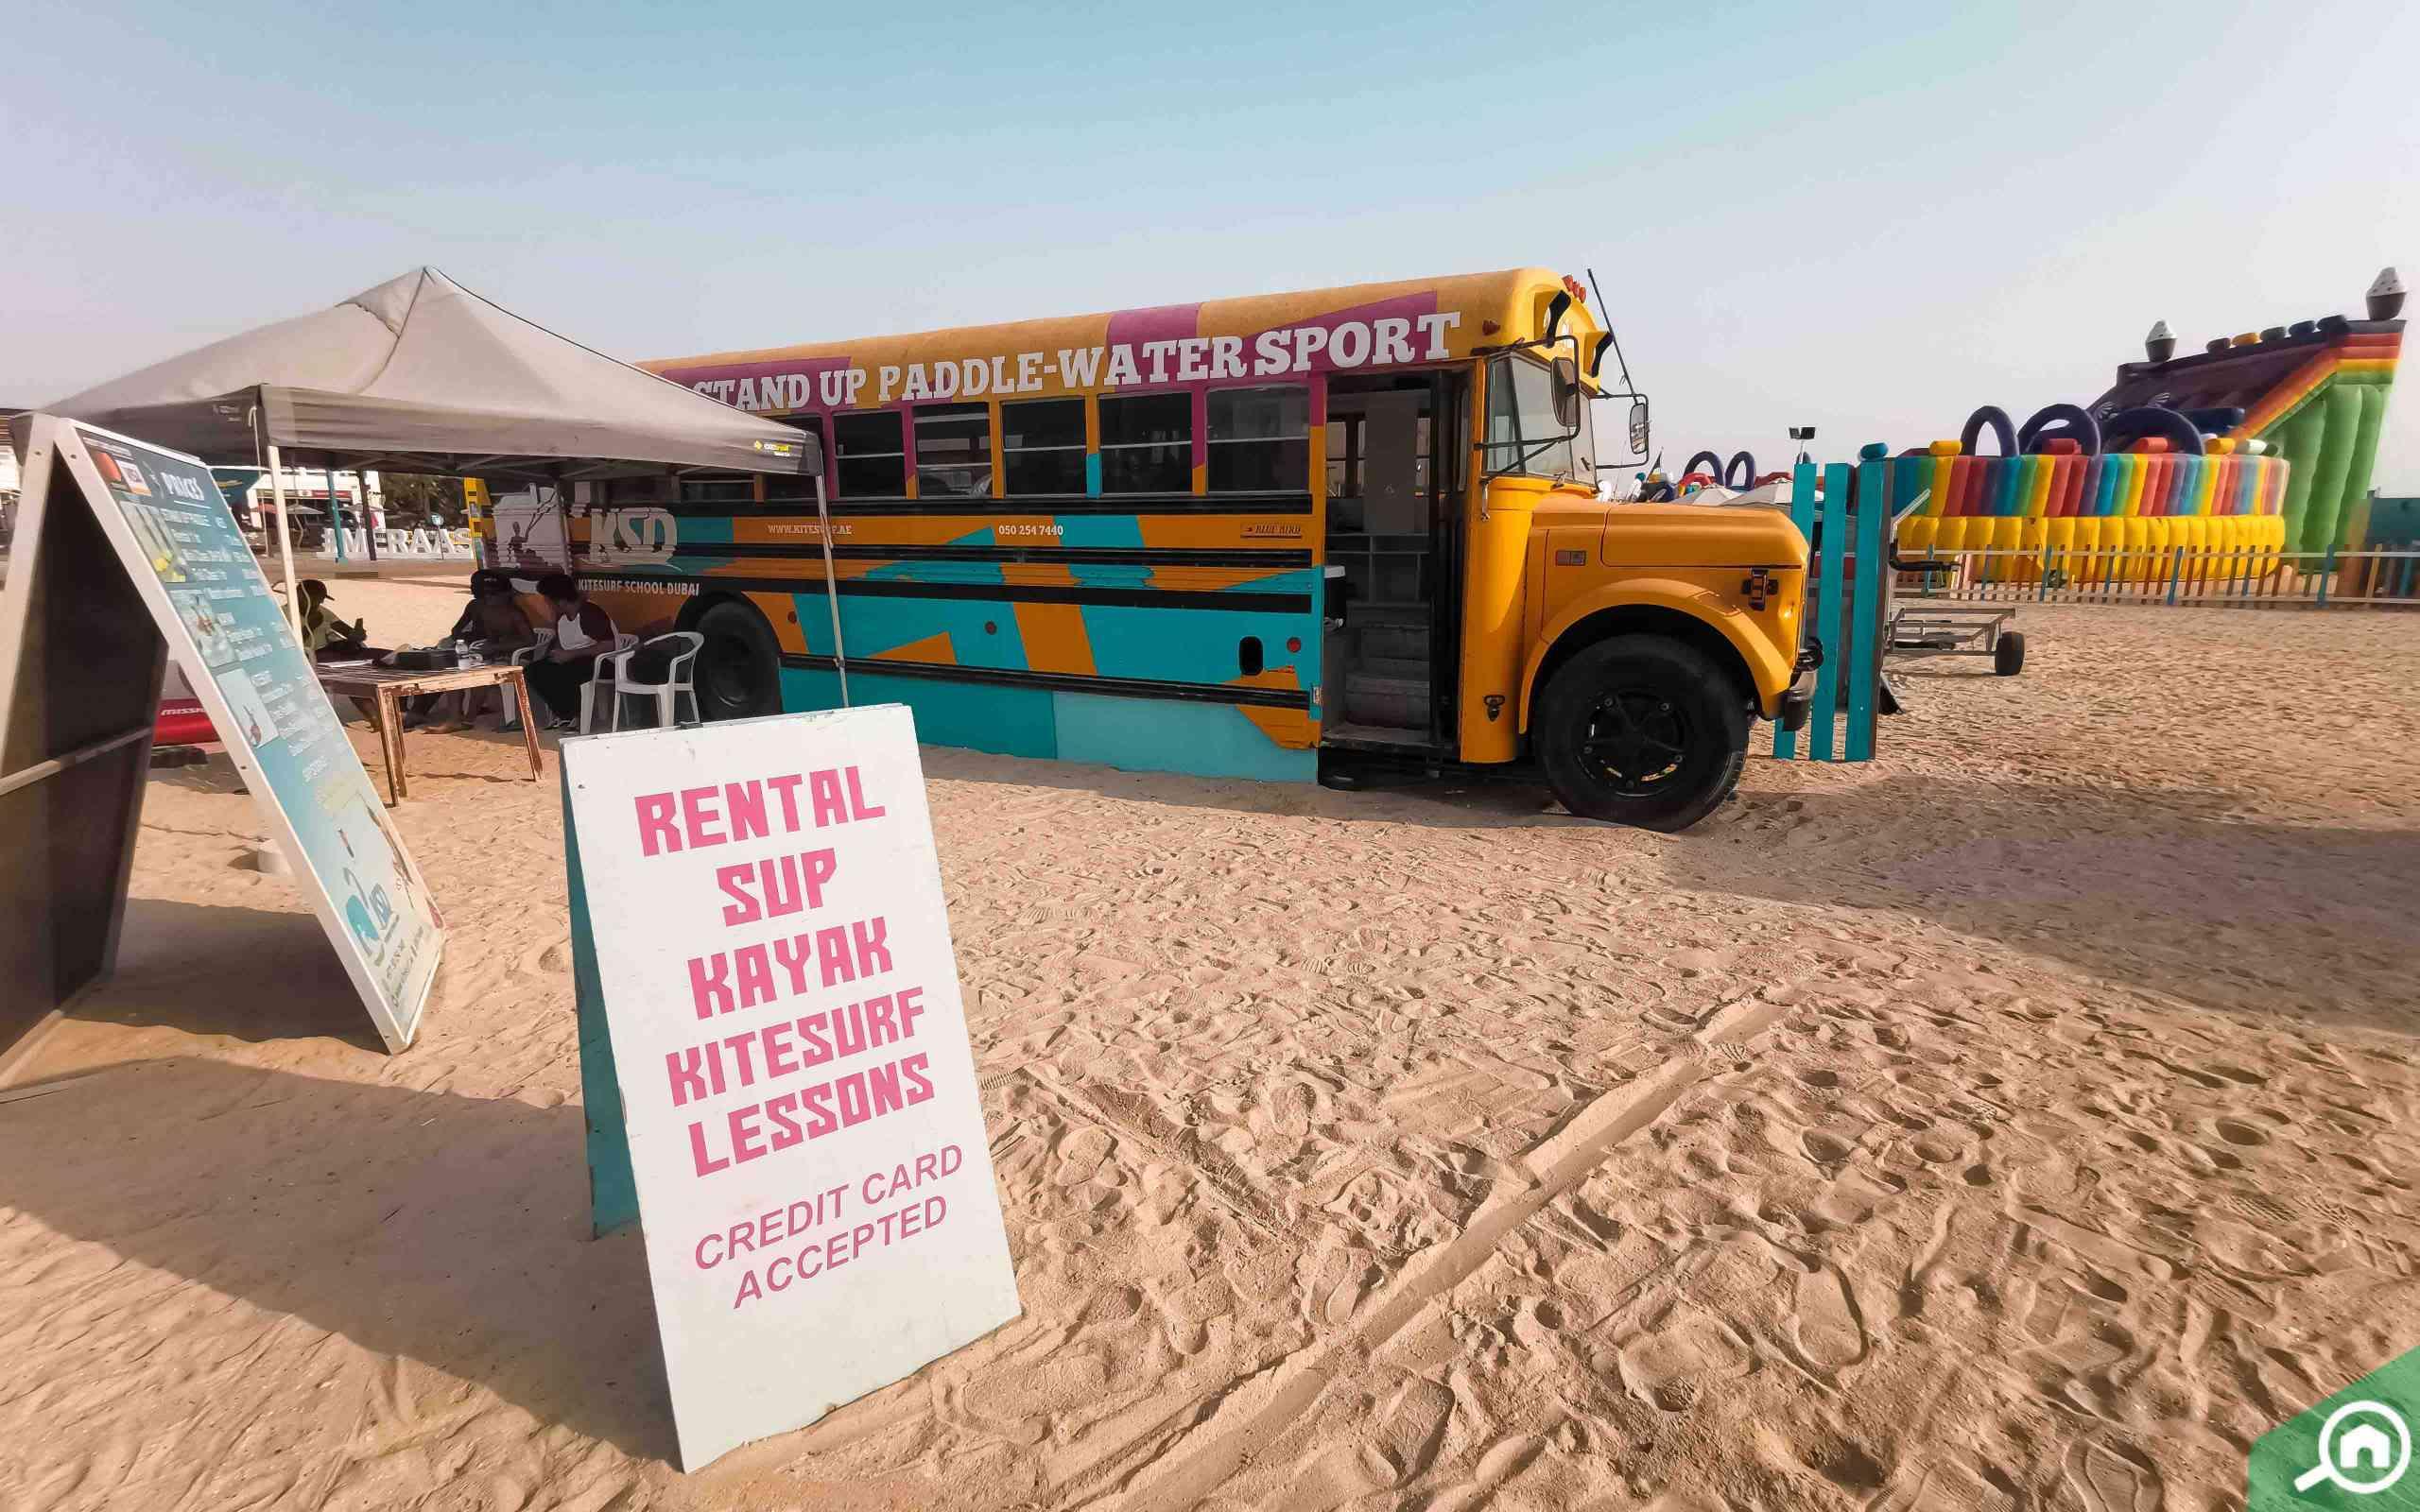 A Guide to Kite Beach Dubai: Water Activities, Restaurants, Timings